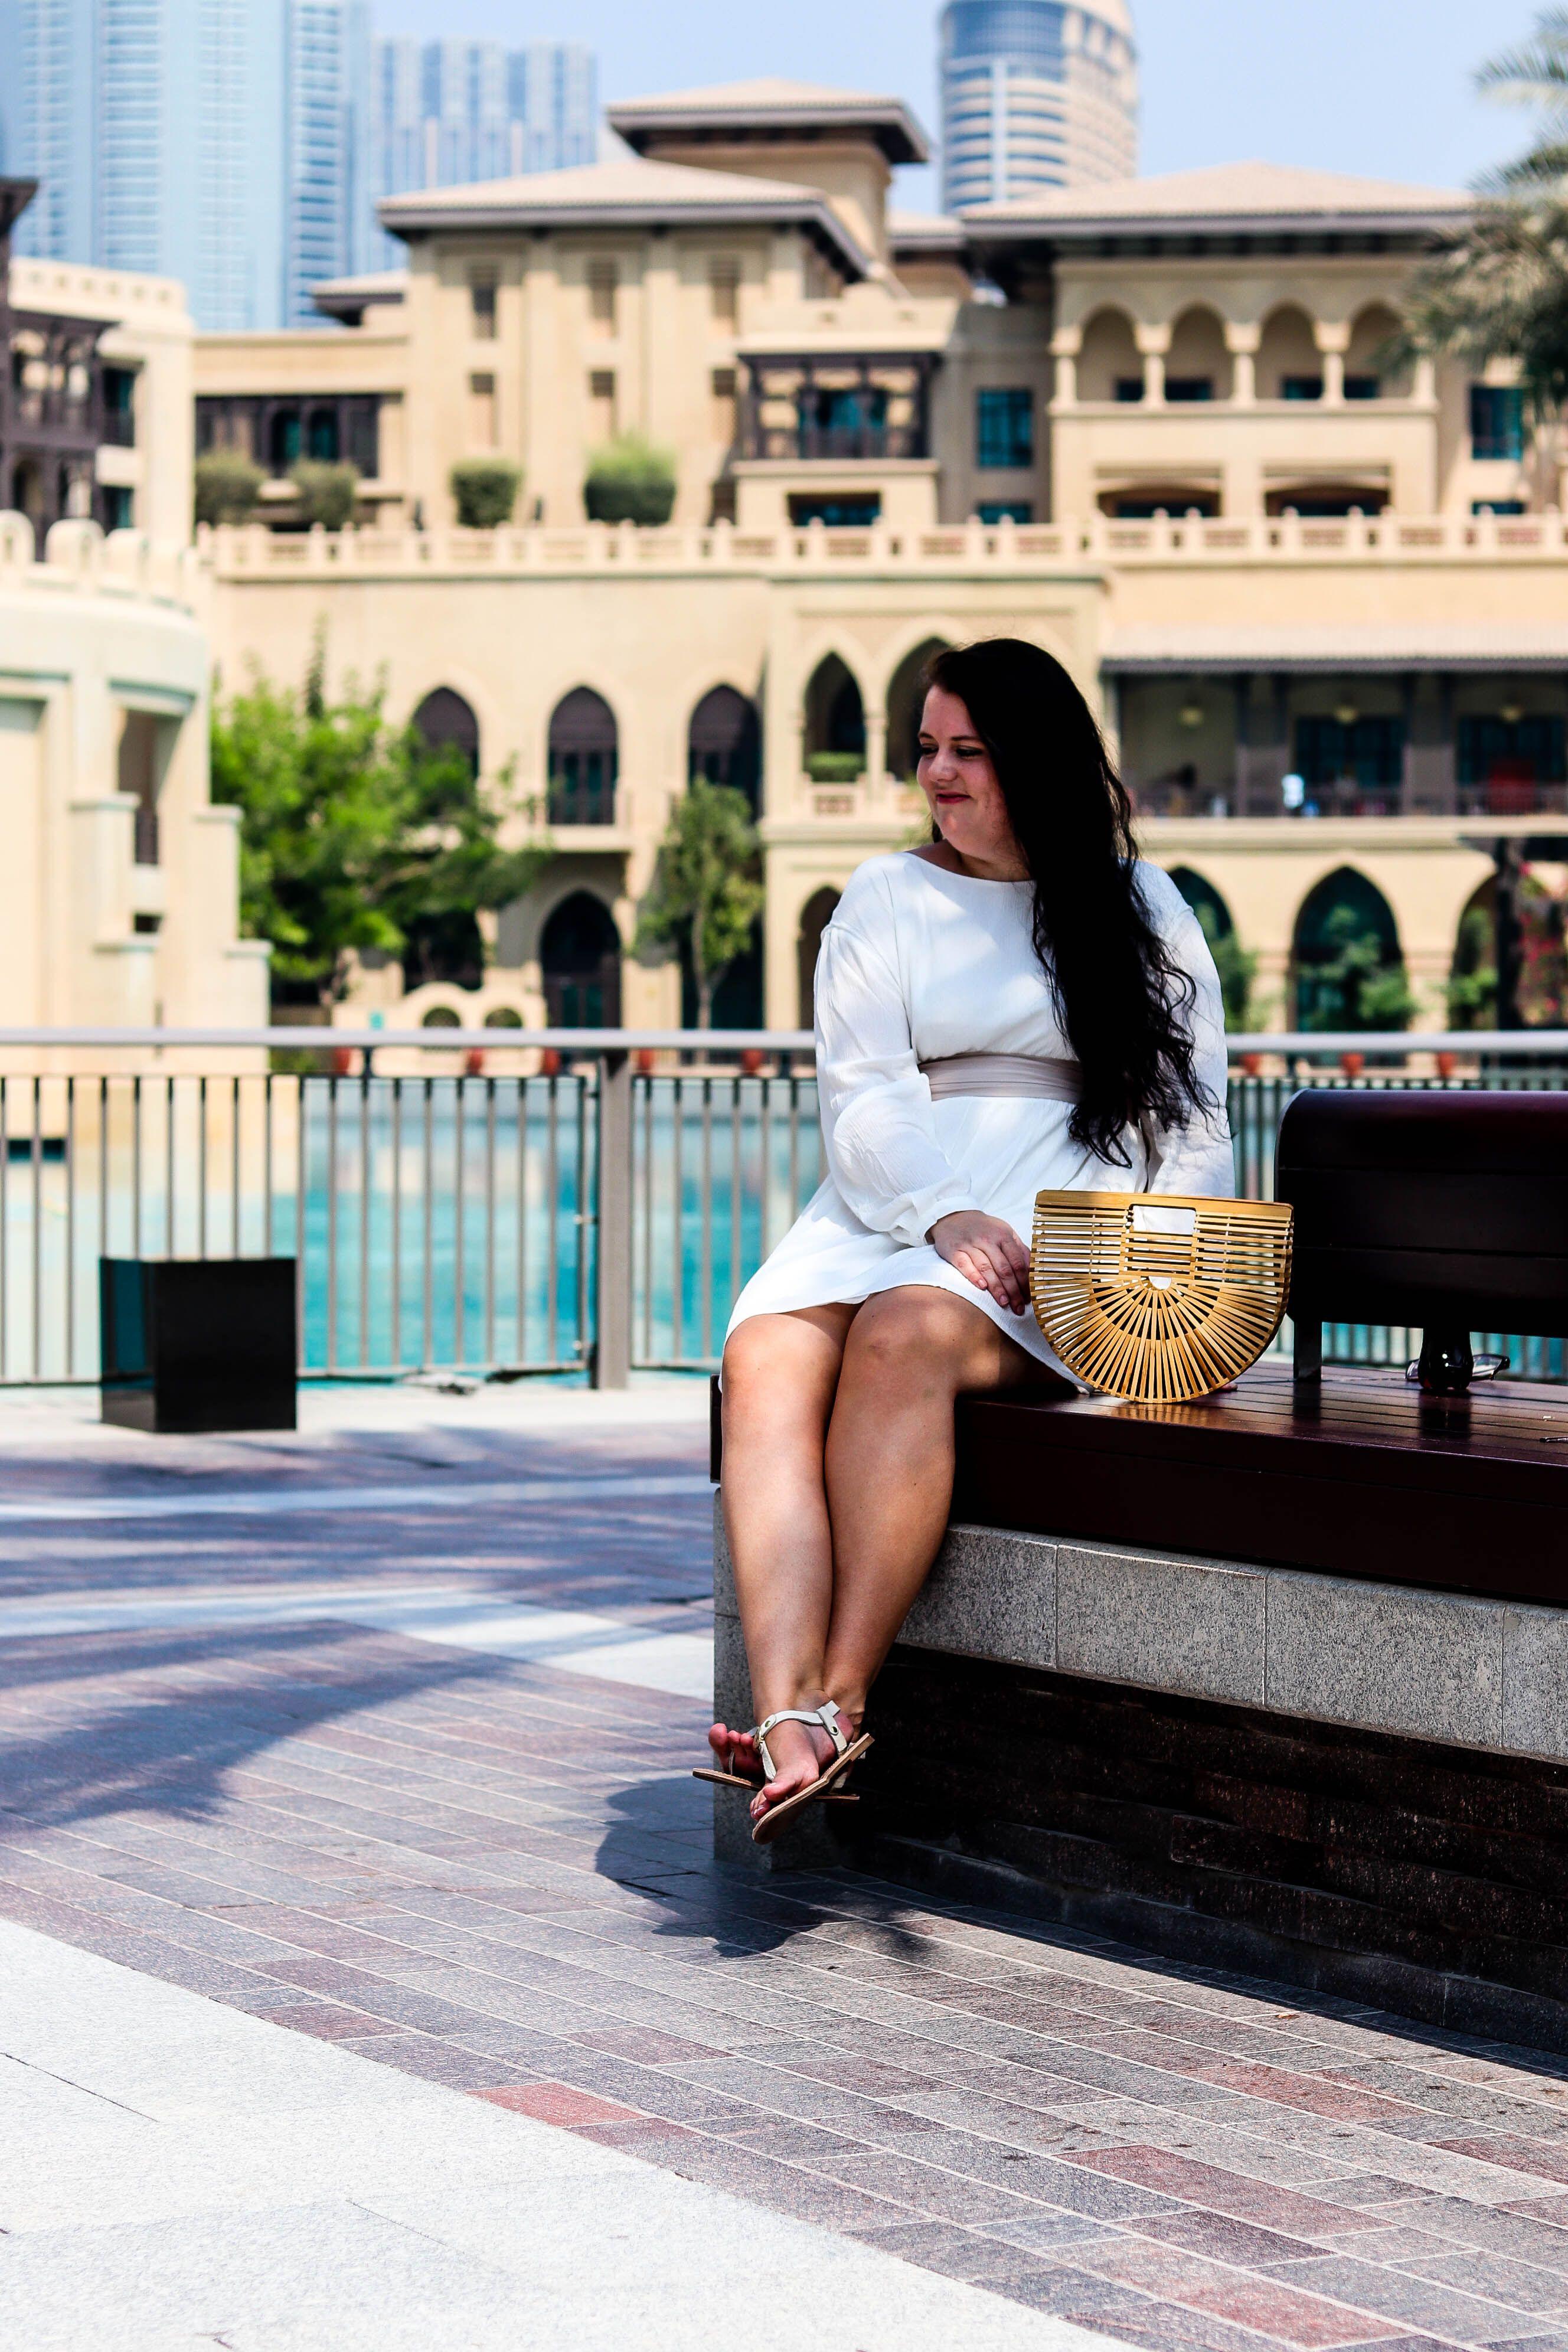 Was Ziehe Ich In Dubai An Dubai Outfit Das Knie Glamour Und